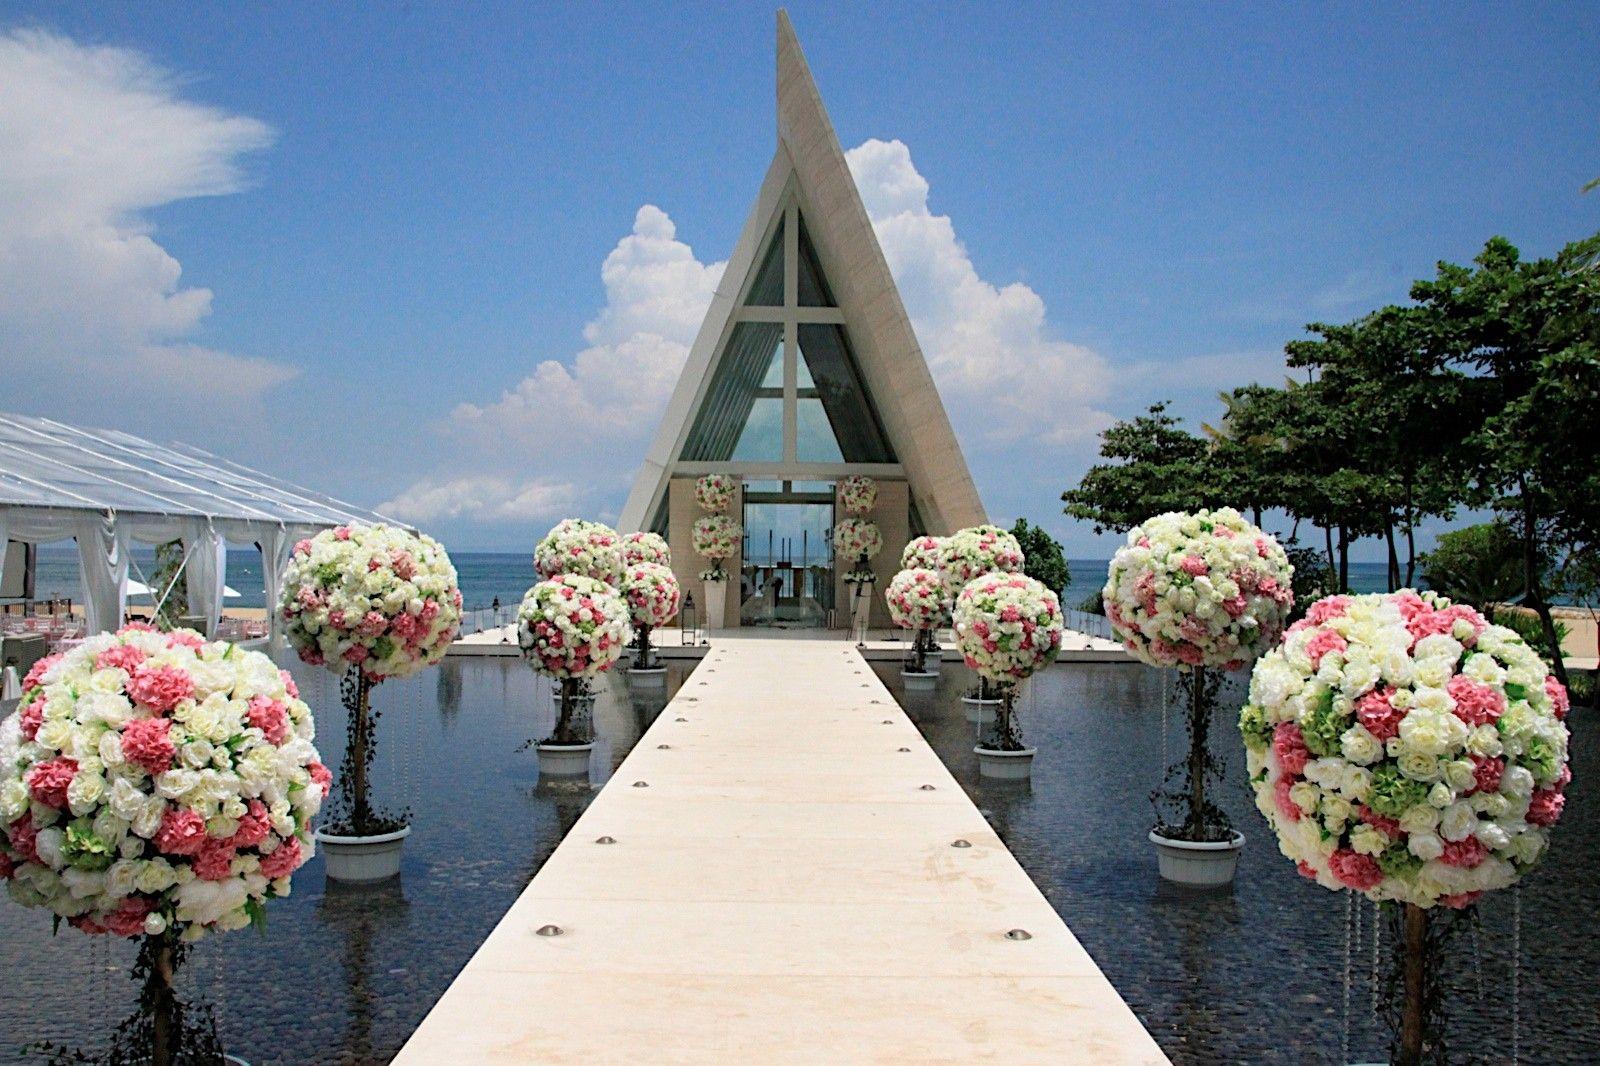 Top 10 Most Elegant Hotels For A Wedding In Bali | Bali ...